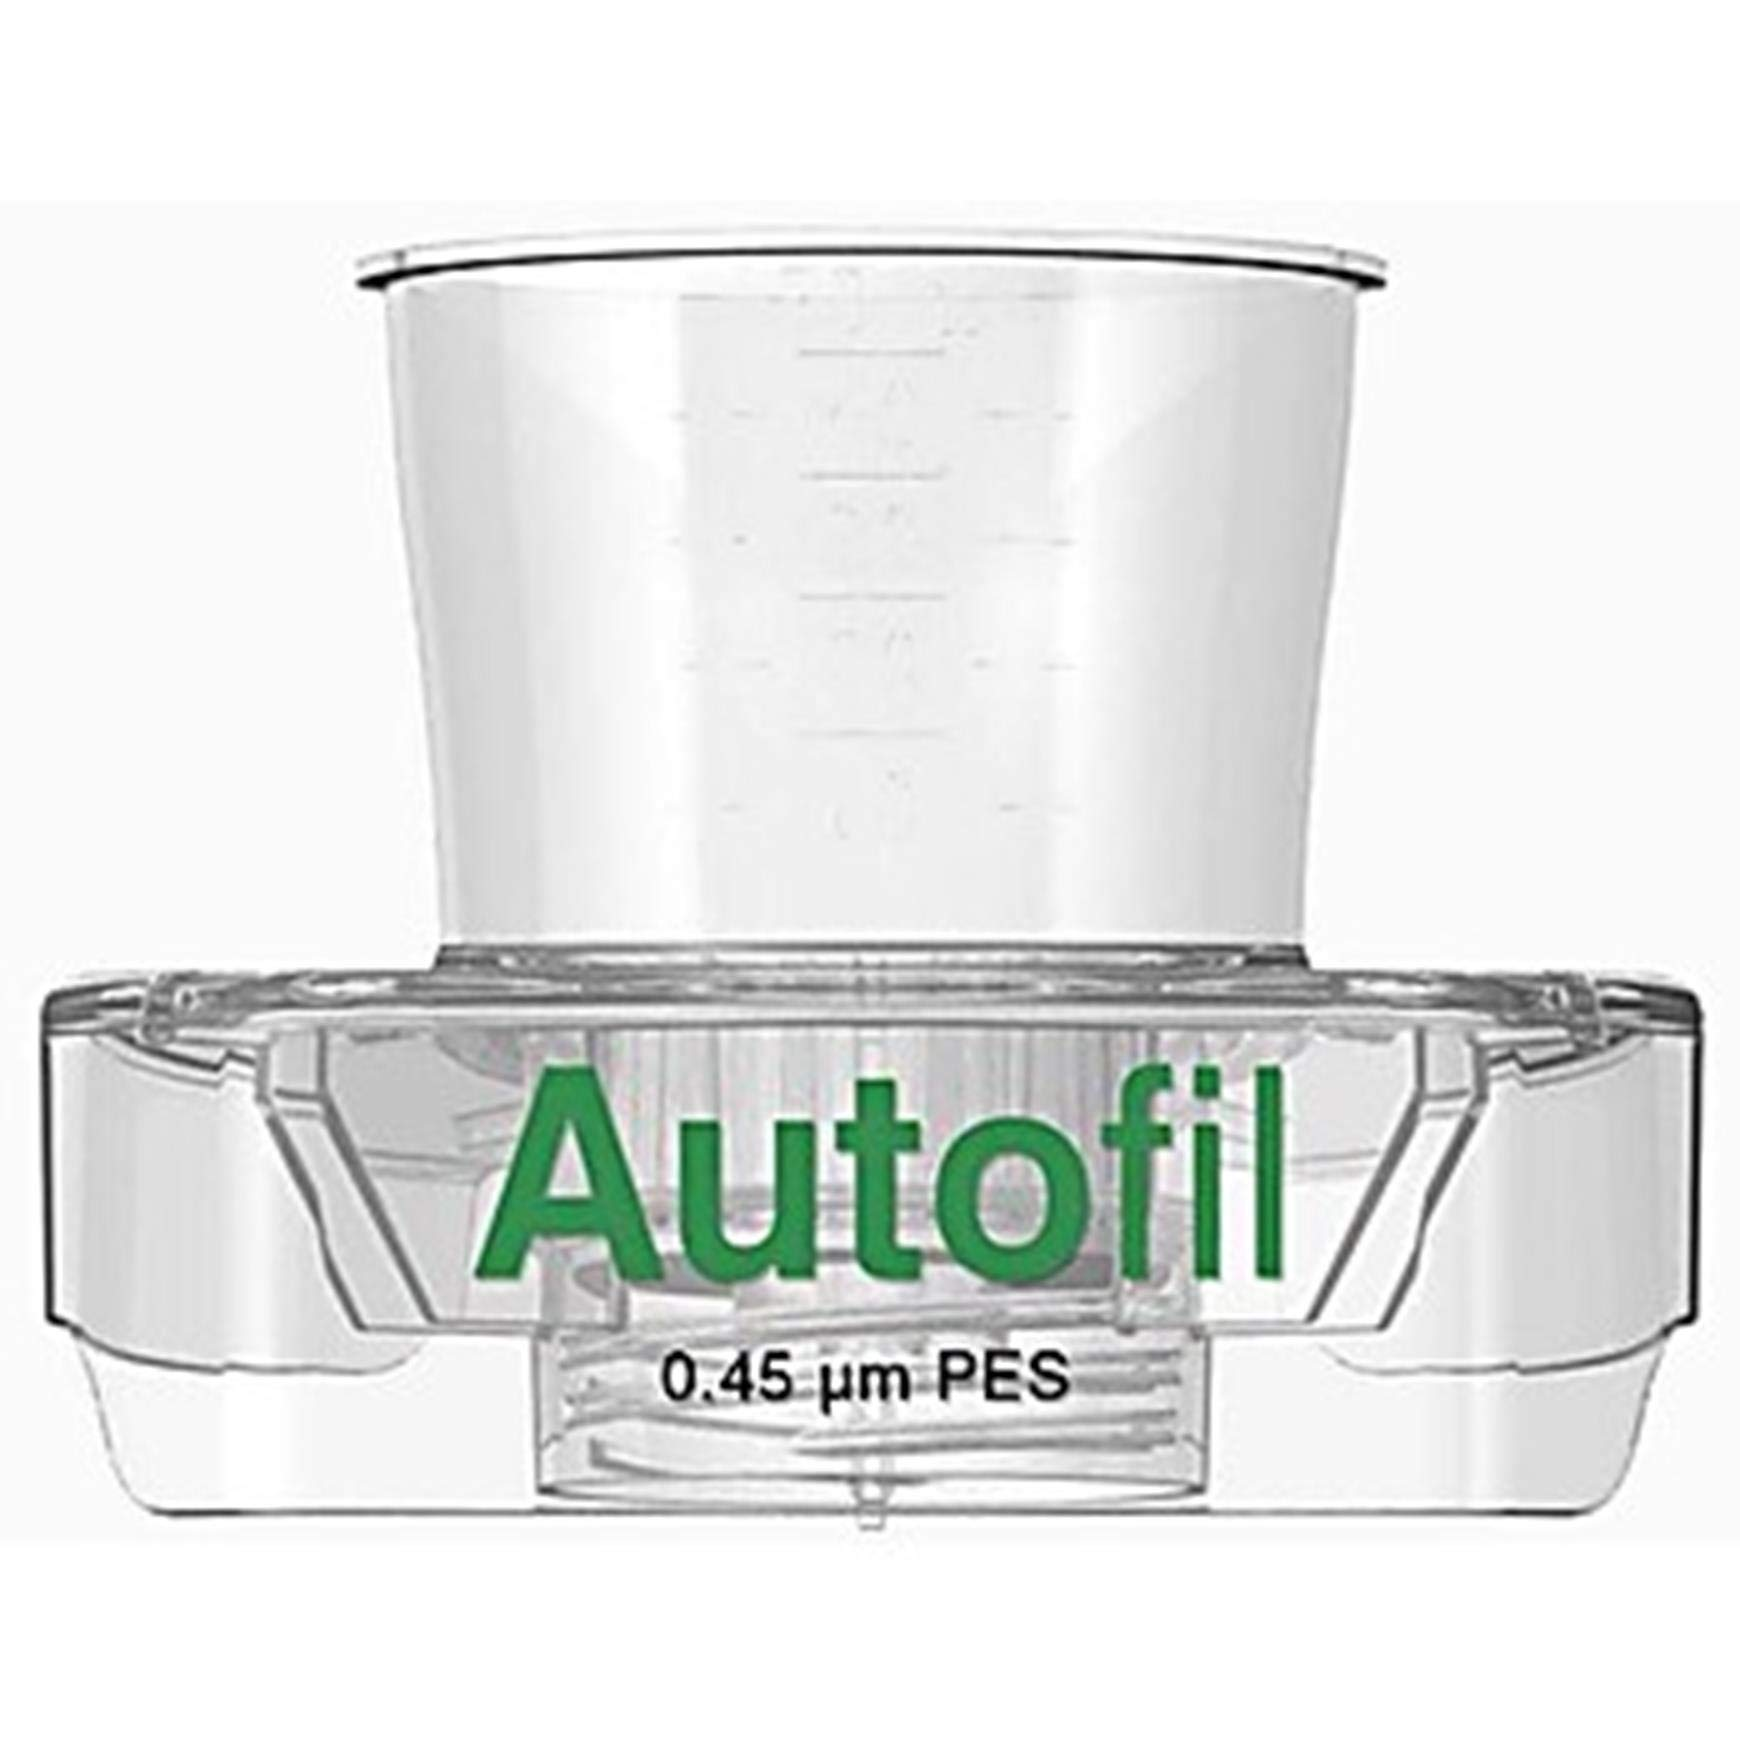 Autofil Sterile Disposable Vacuum Bottle Top Filters with 0.45um PES Membrane for Prefiltration or Clarification, 500mL, 24/CS by Foxx Life Sciences